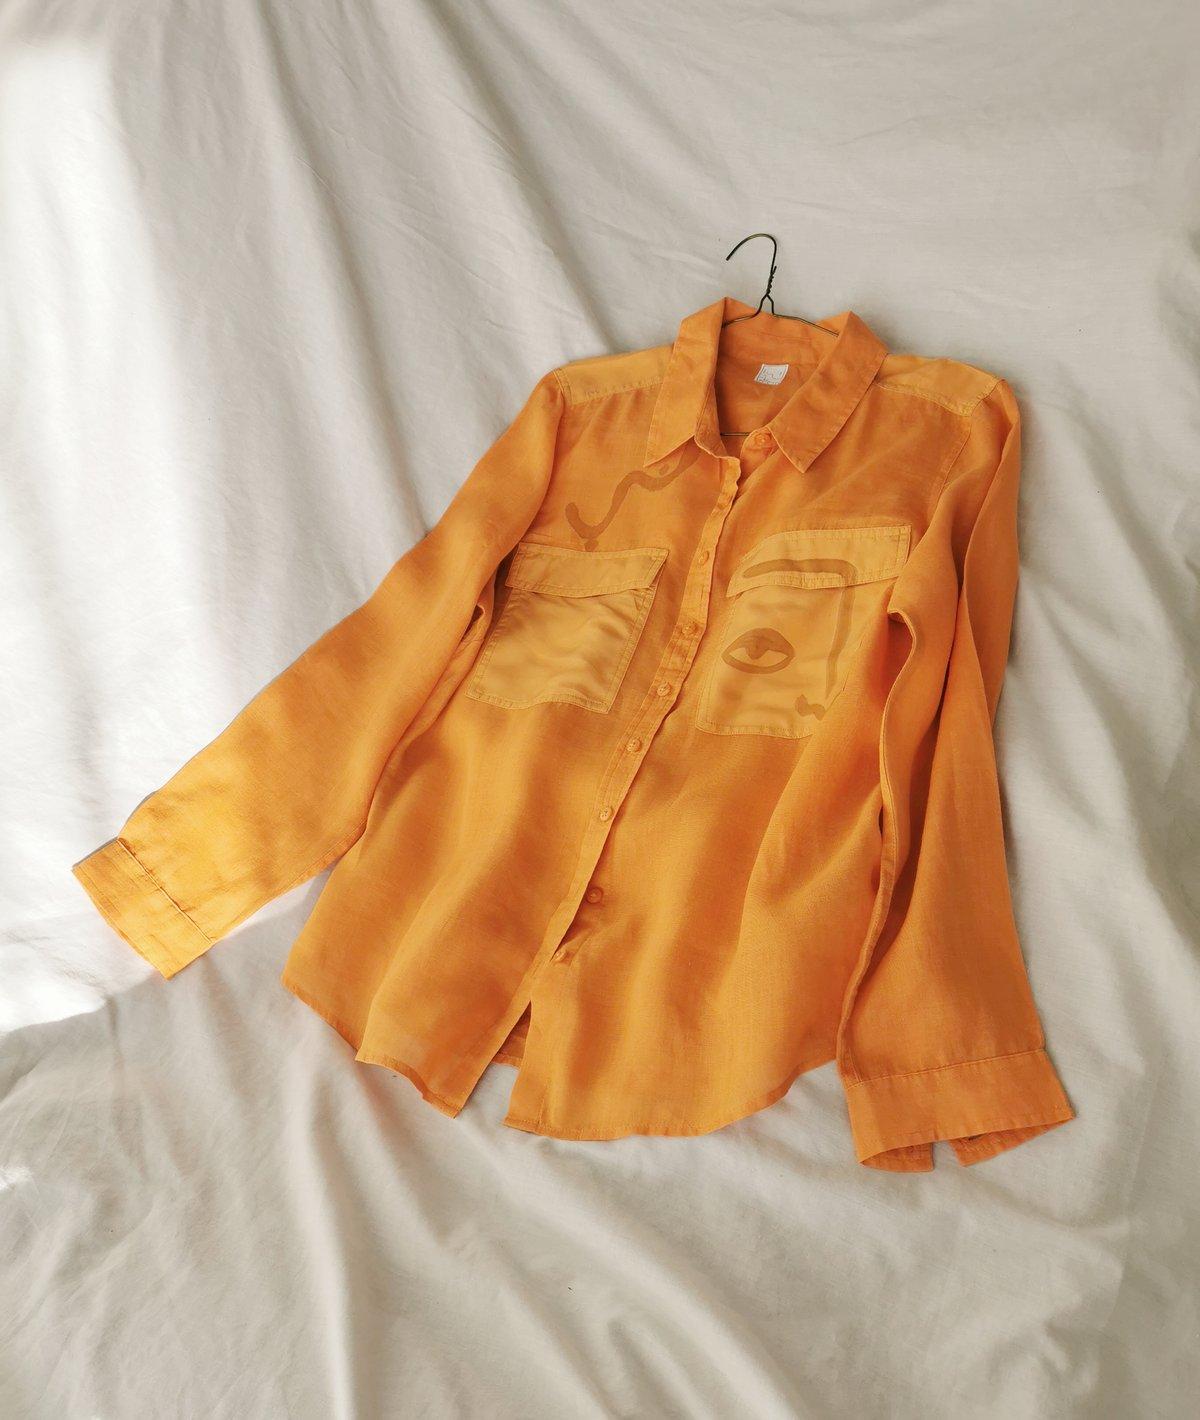 Image of tangerine shirt